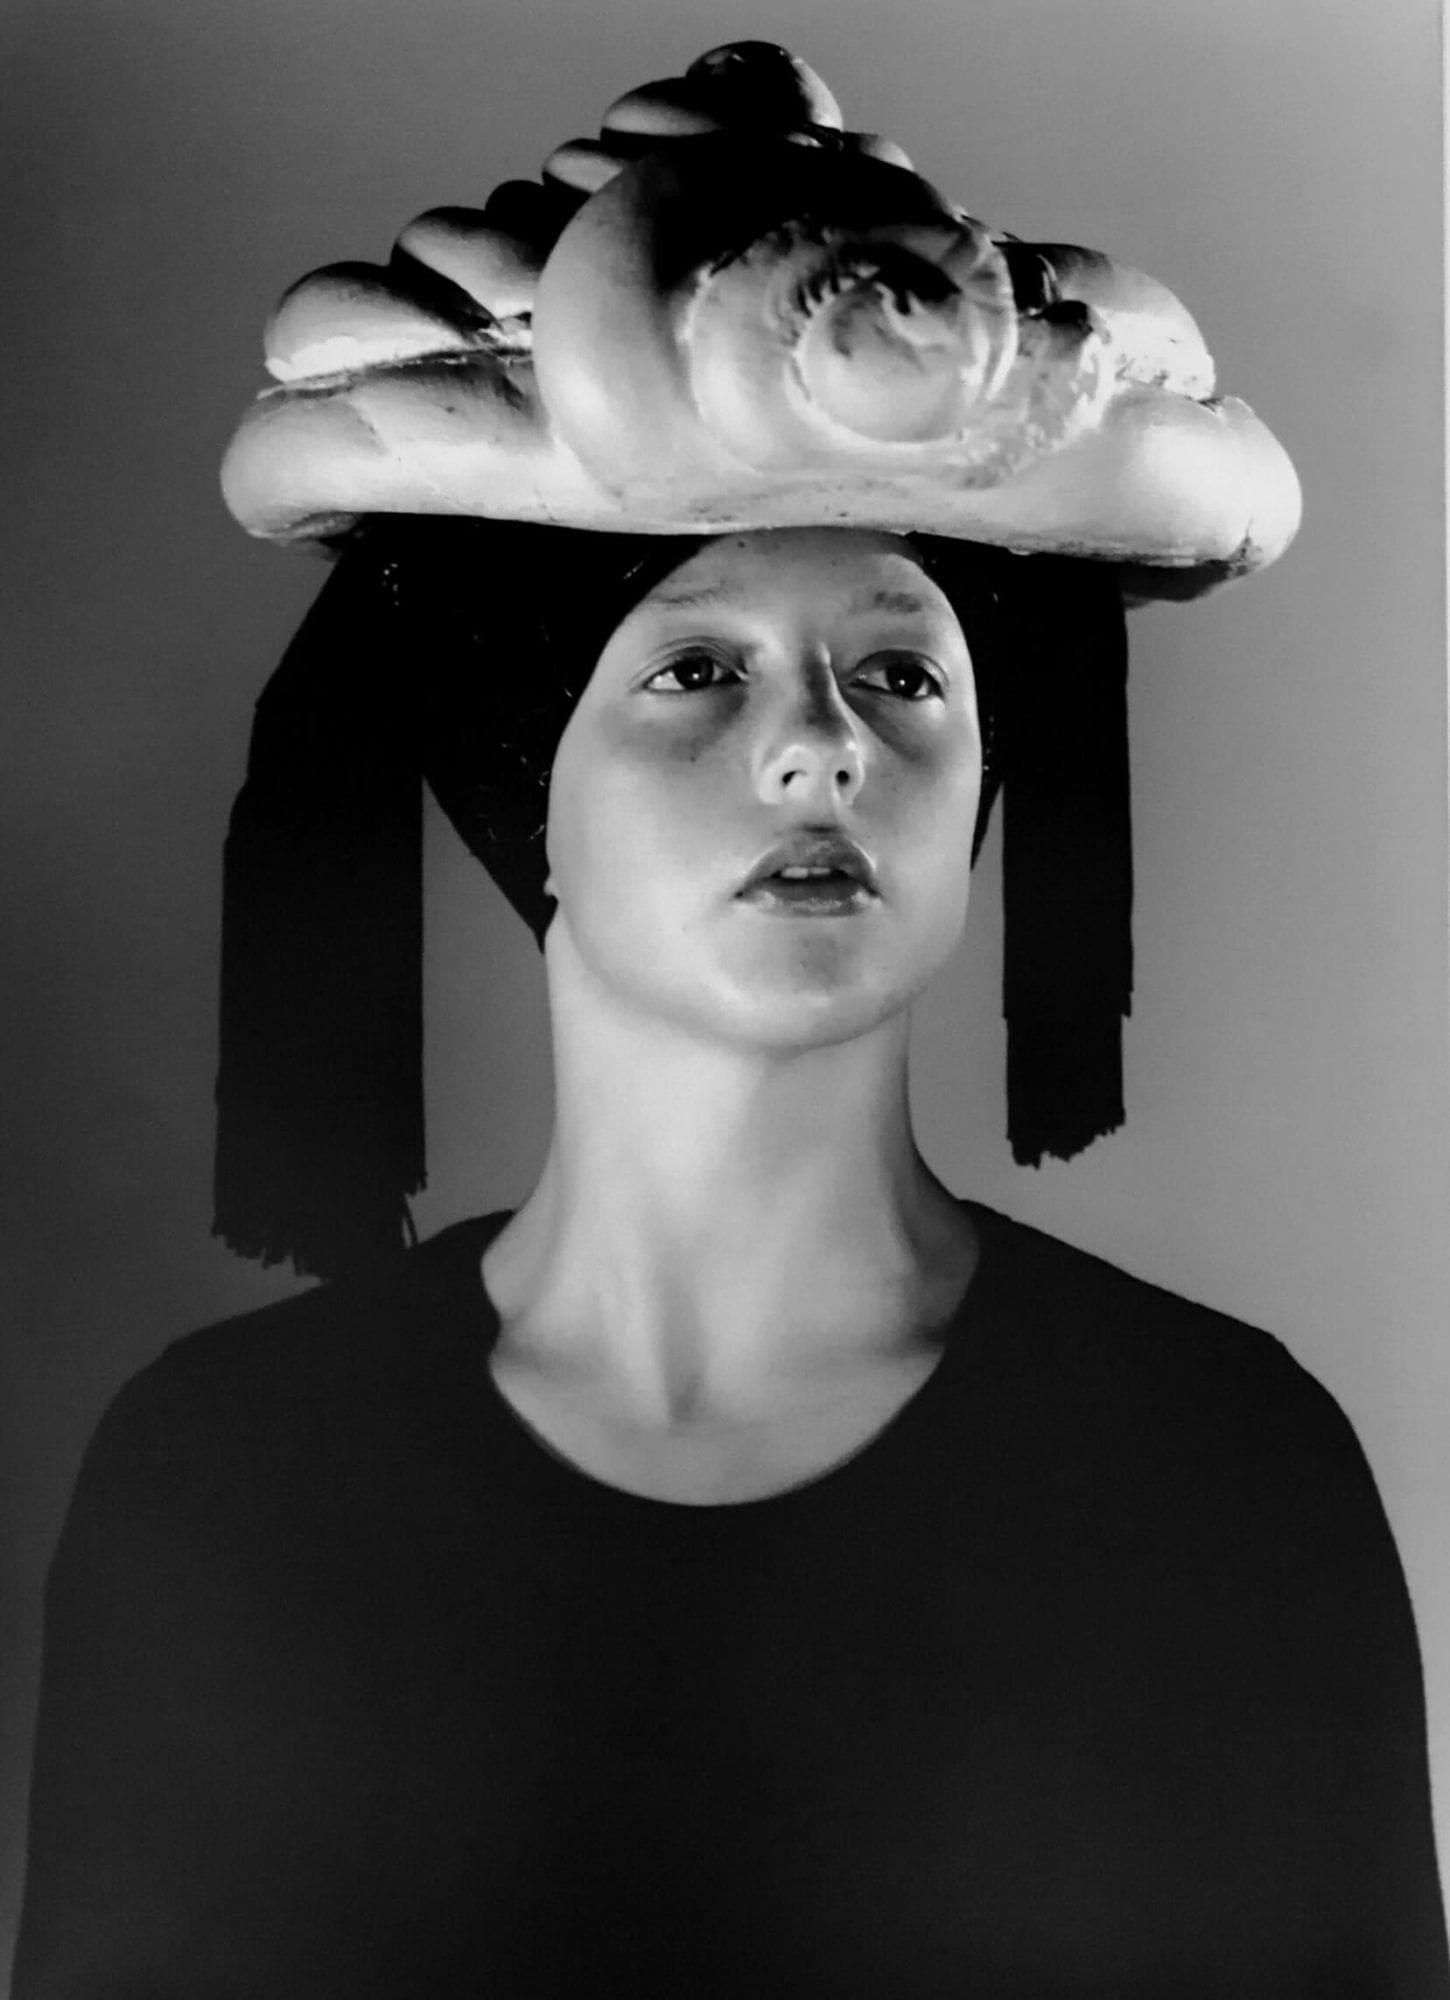 Eva Lootz, Little theatre of drifting detours I won, I won, she says and whistles 3 times, 1994